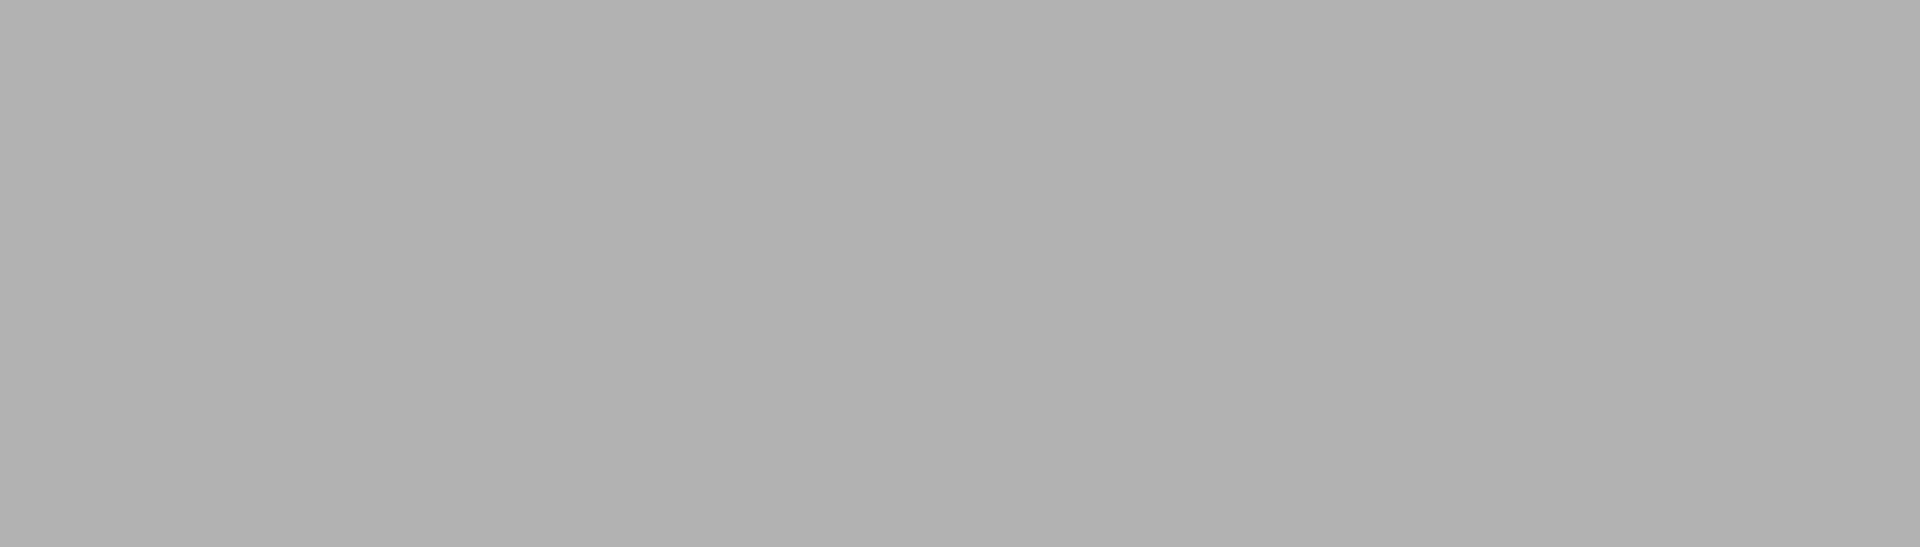 bg_grey